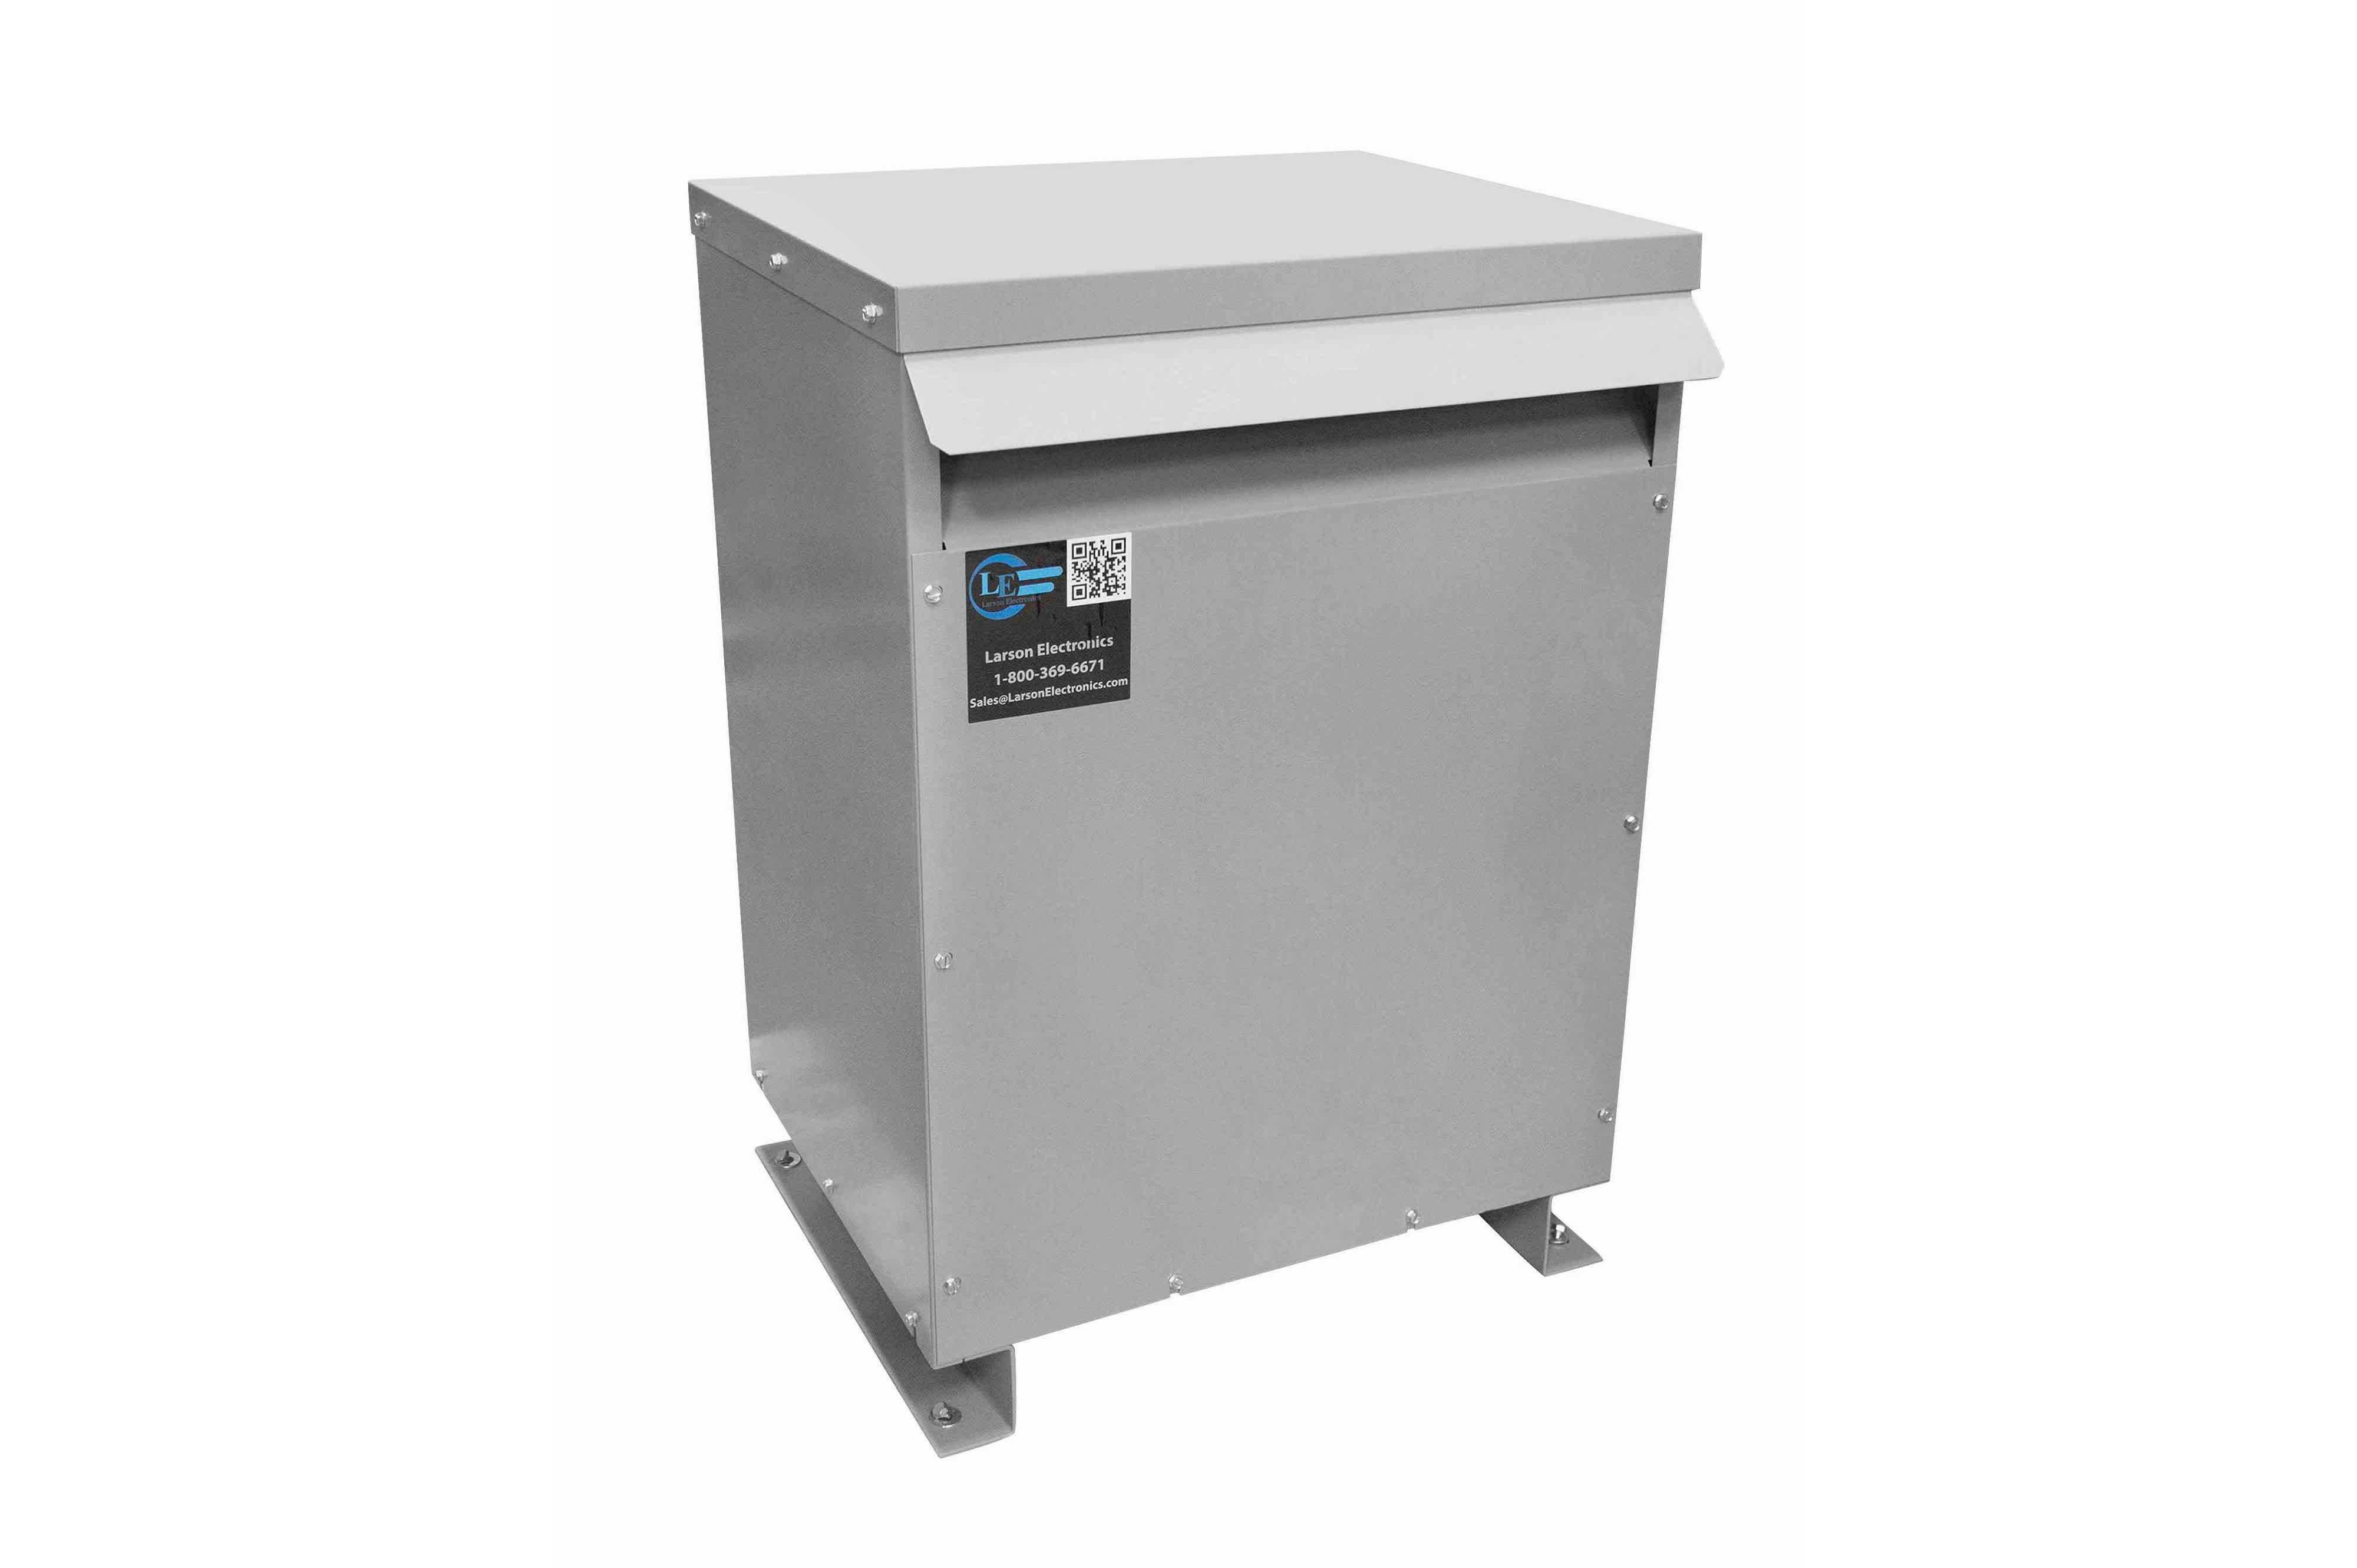 115 kVA 3PH Isolation Transformer, 380V Wye Primary, 480Y/277 Wye-N Secondary, N3R, Ventilated, 60 Hz